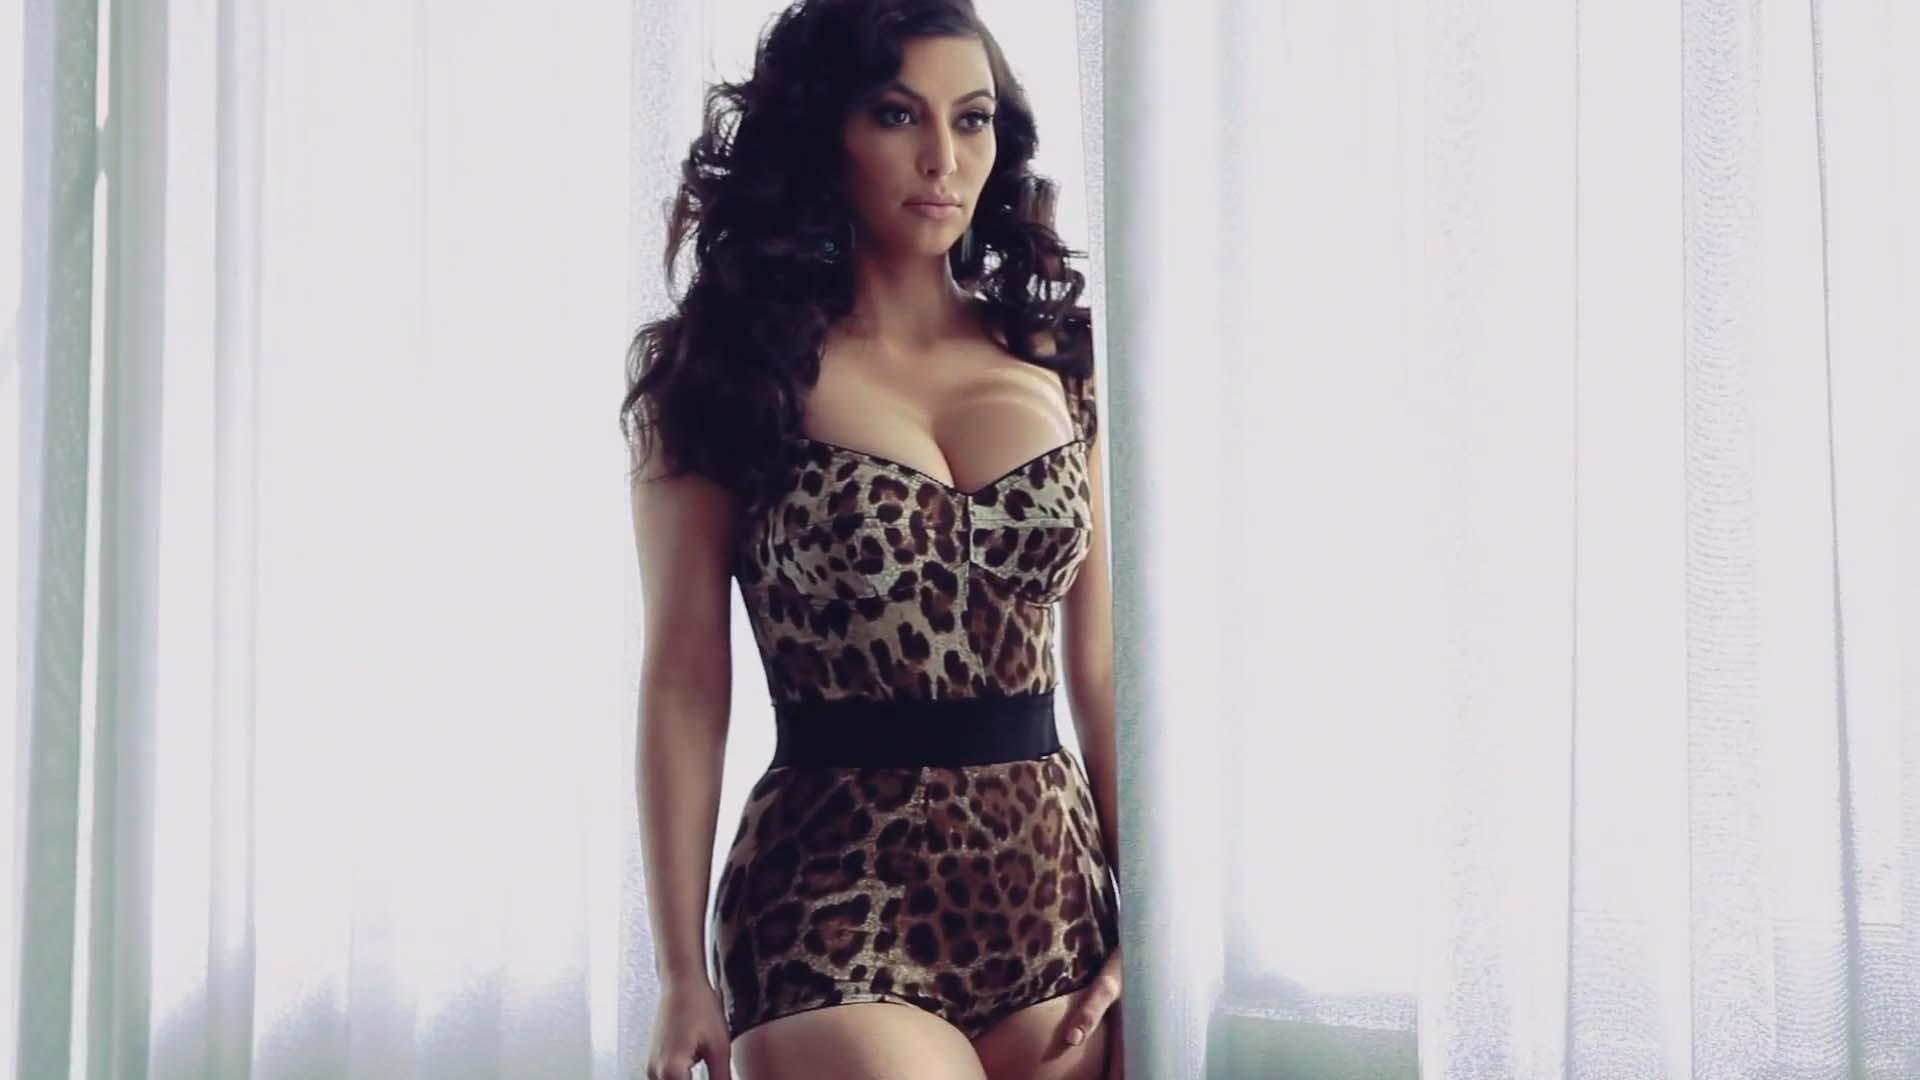 Kim Kardashian For Desktop Background